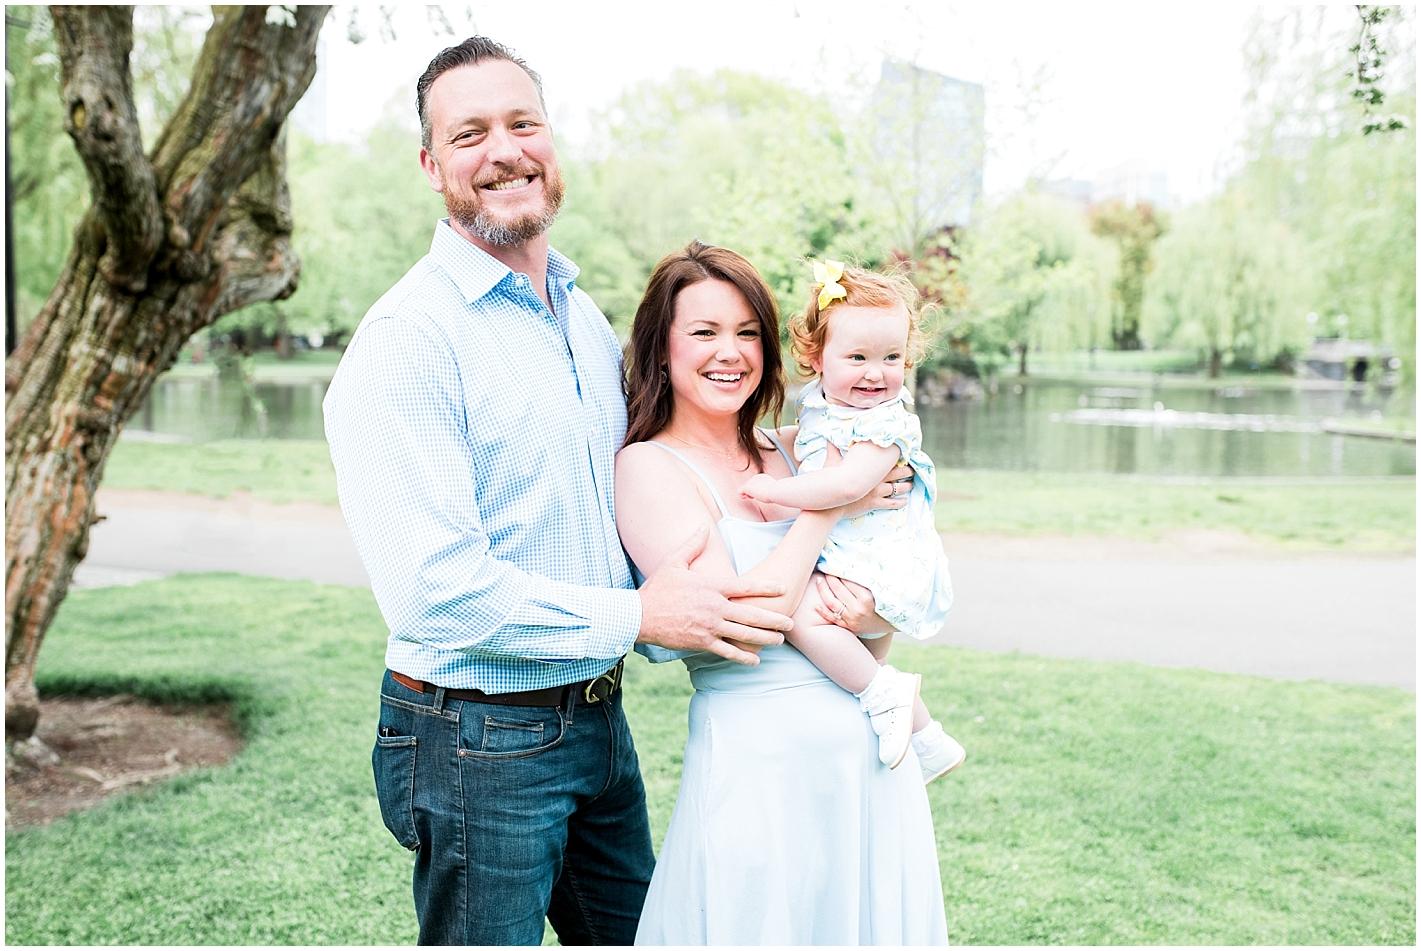 BPG Family photo shoot  by Alyssa Parker Photography